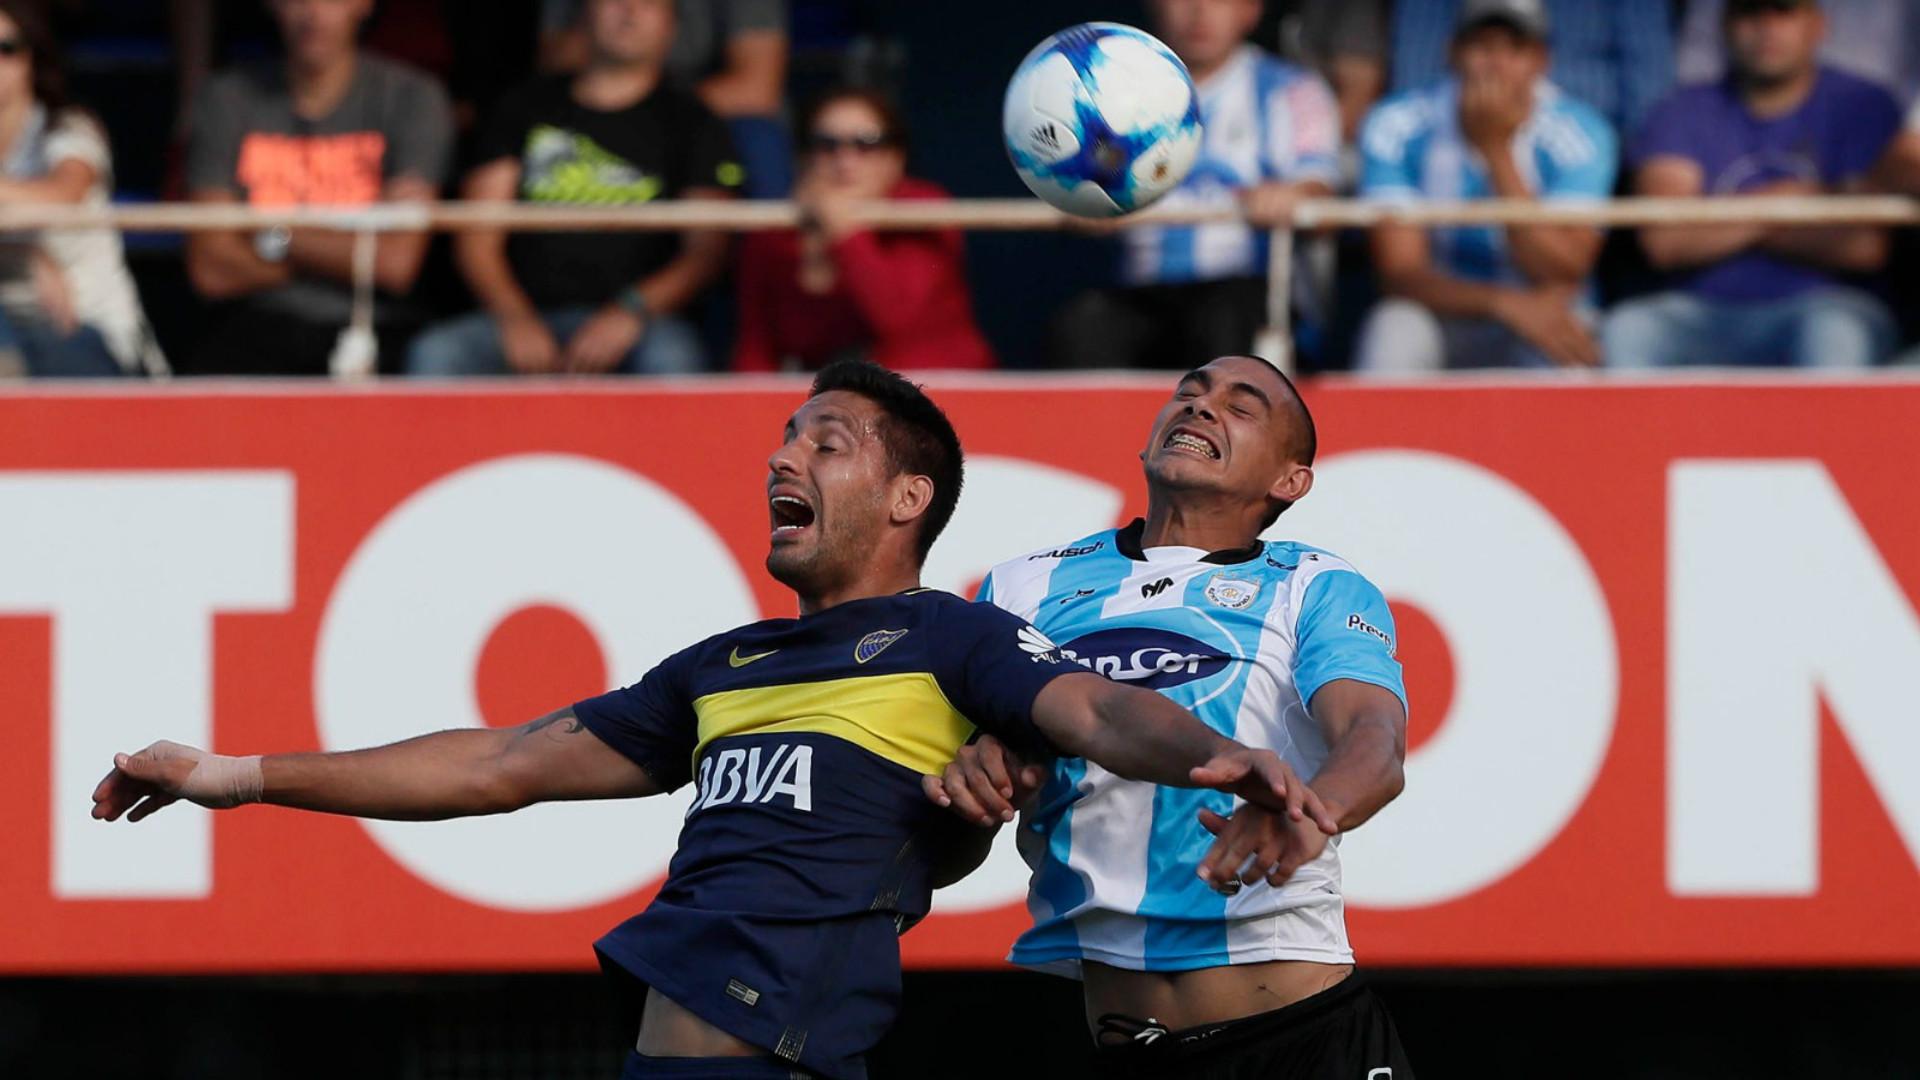 Insaurralde Atletico de Rafaela Boca Campeonato Primera Division Fecha 21 23042017